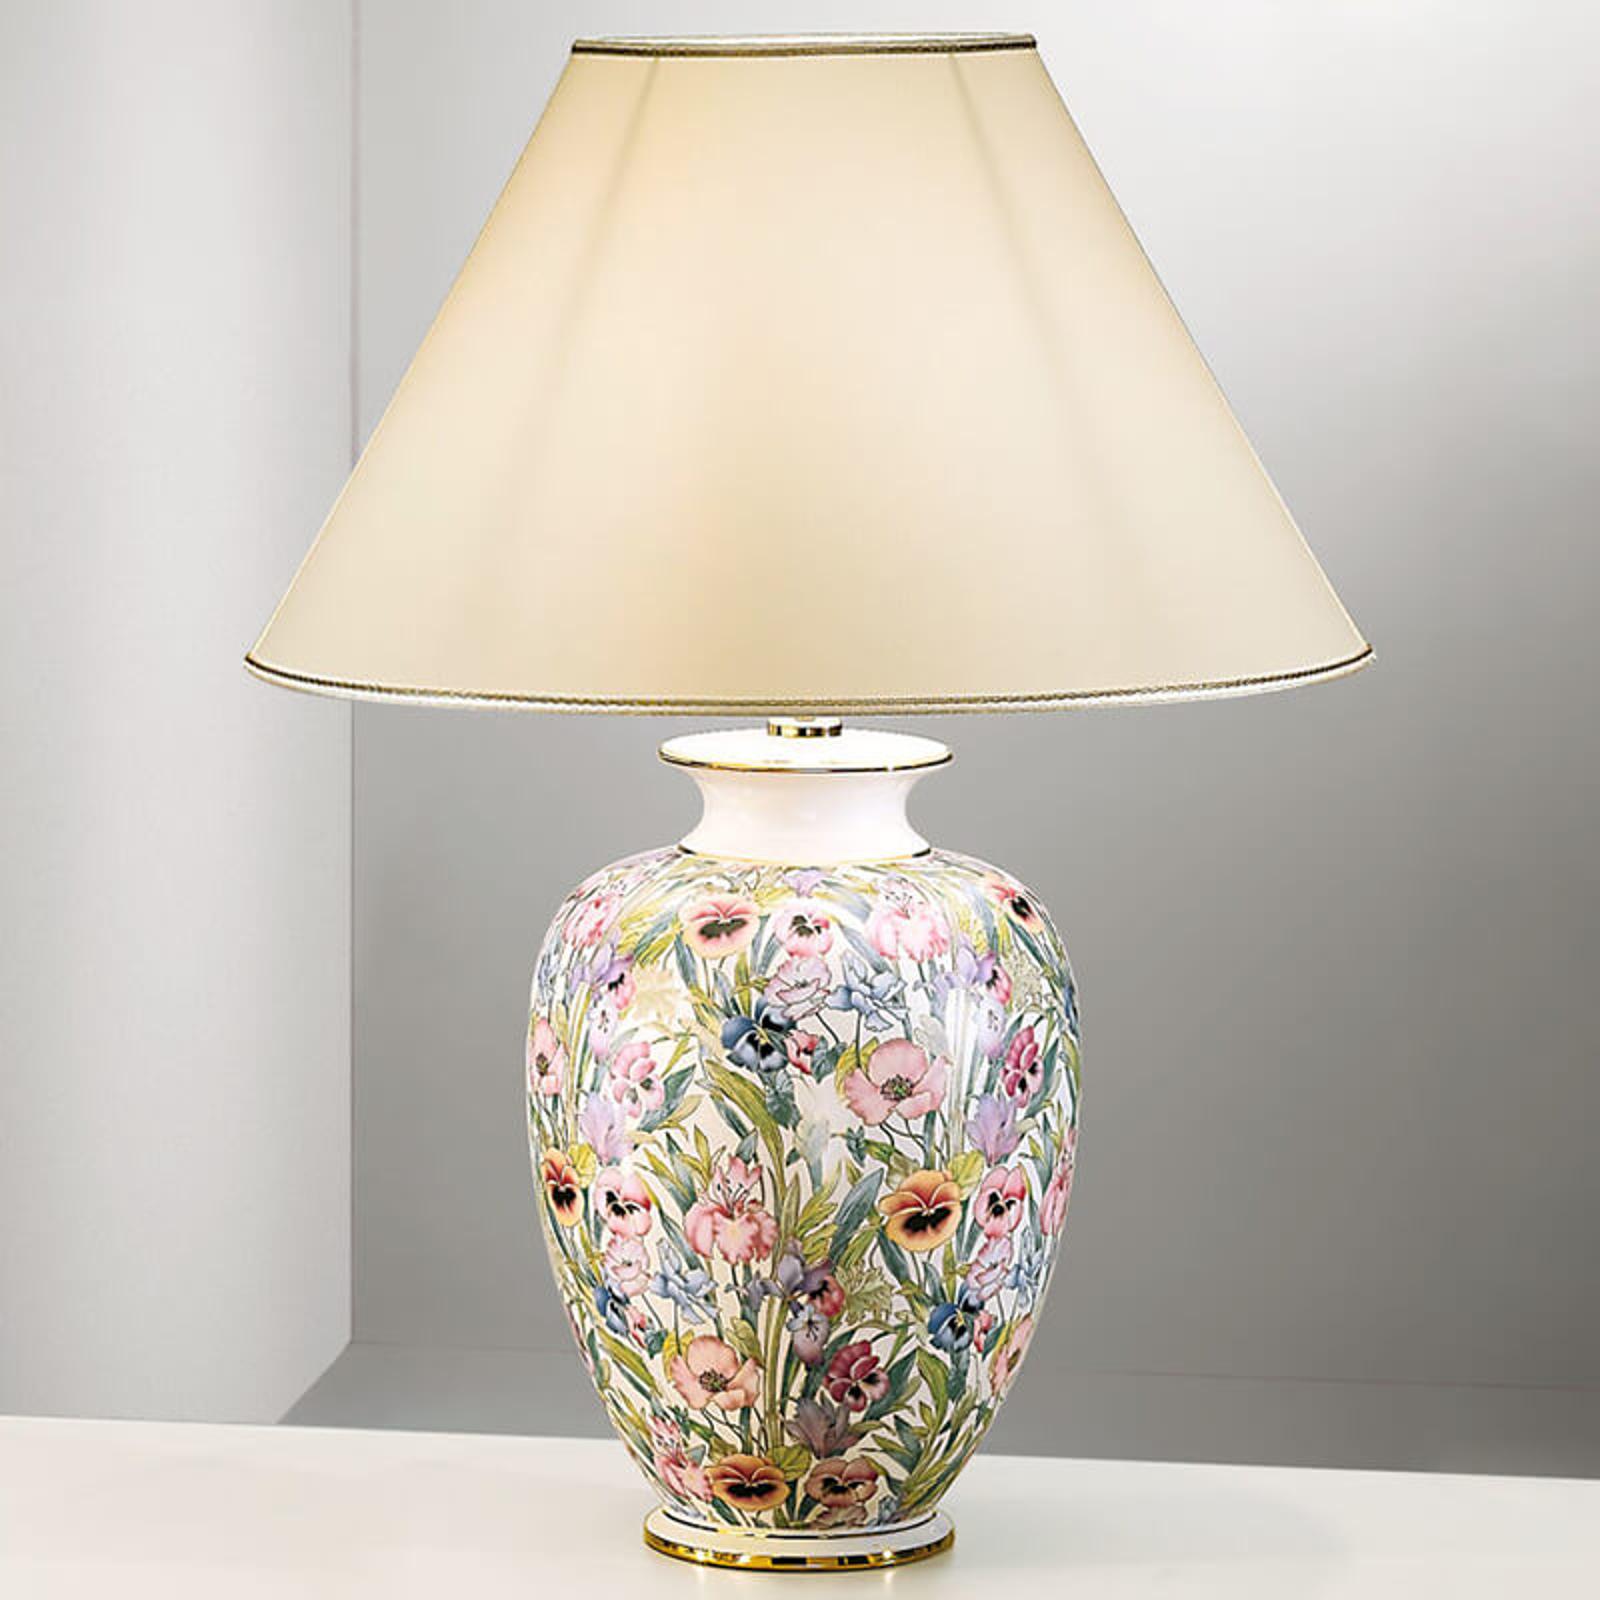 Handbeschilderde tafellamp GIARDINO PANSE, 50 cm